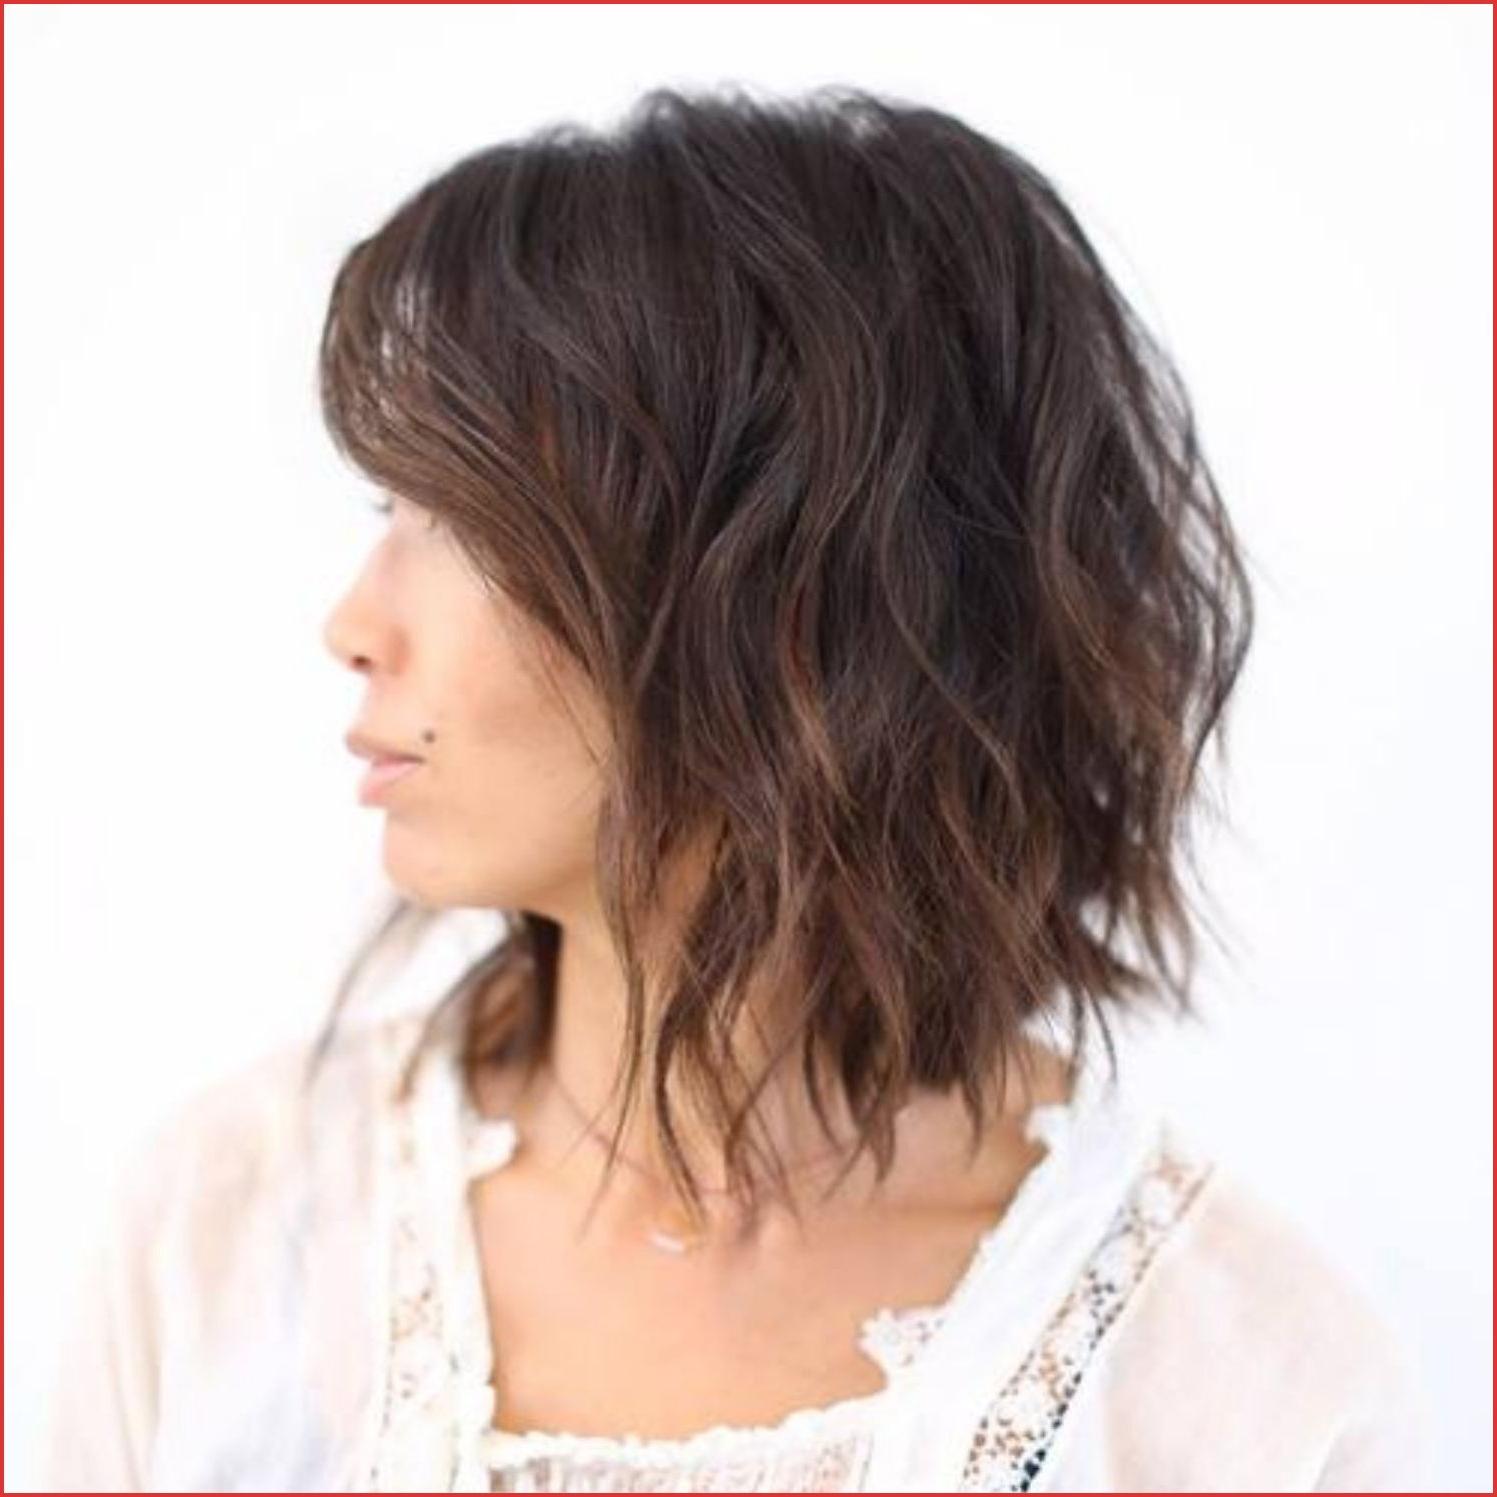 Latest Medium Choppy Shag Haircuts With Bangs Pertaining To Hairstyles For Medium Thick Hair With Bangs Medium Shag (View 9 of 20)